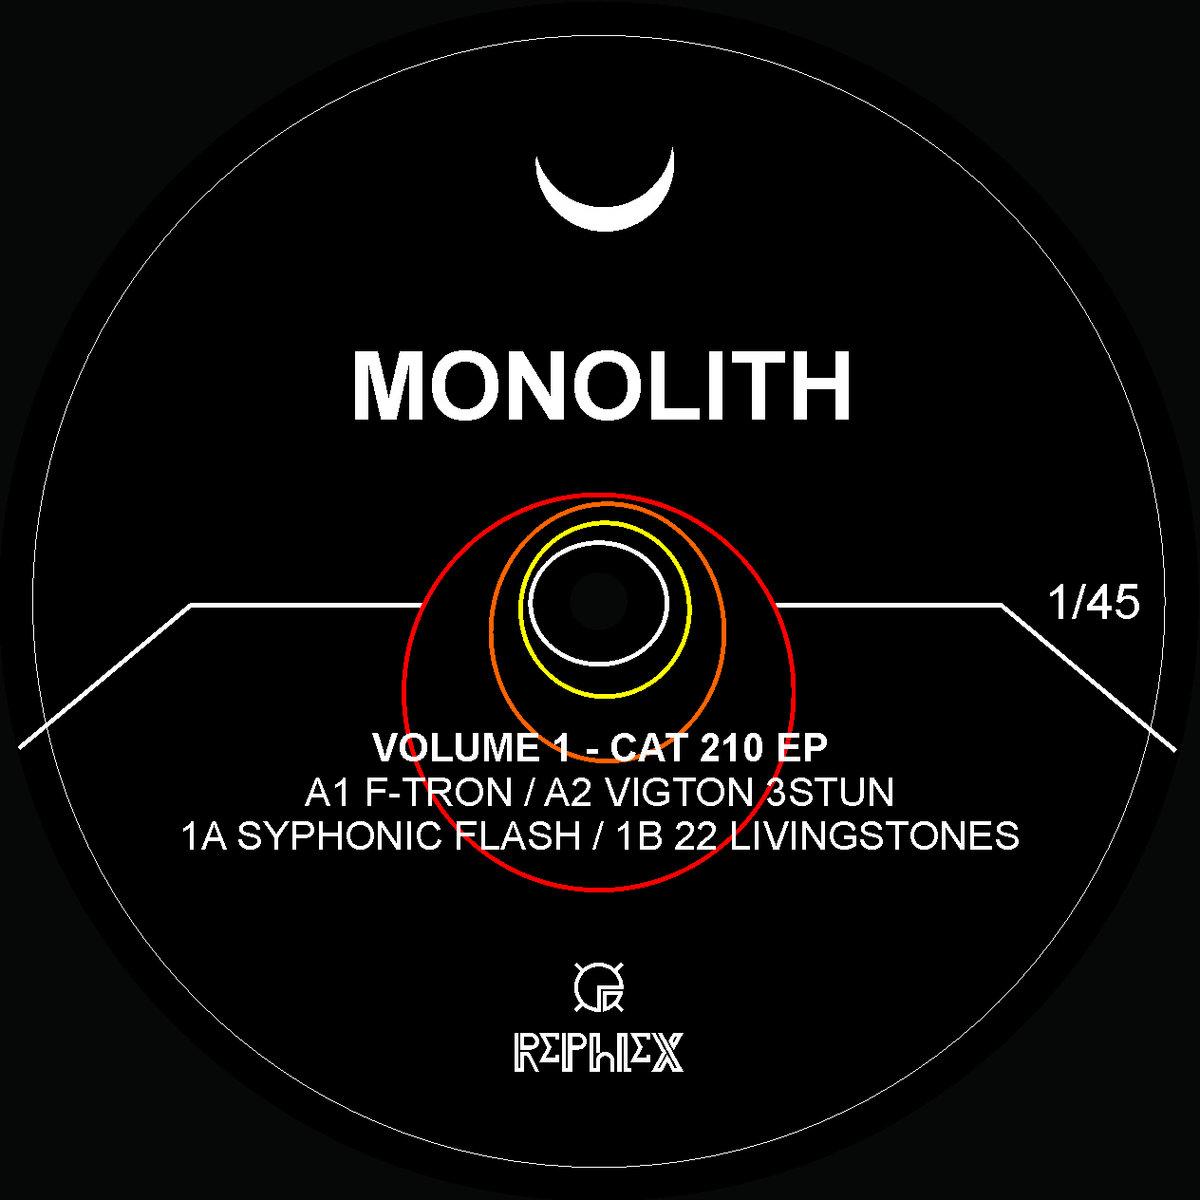 monolith 1993 dvd